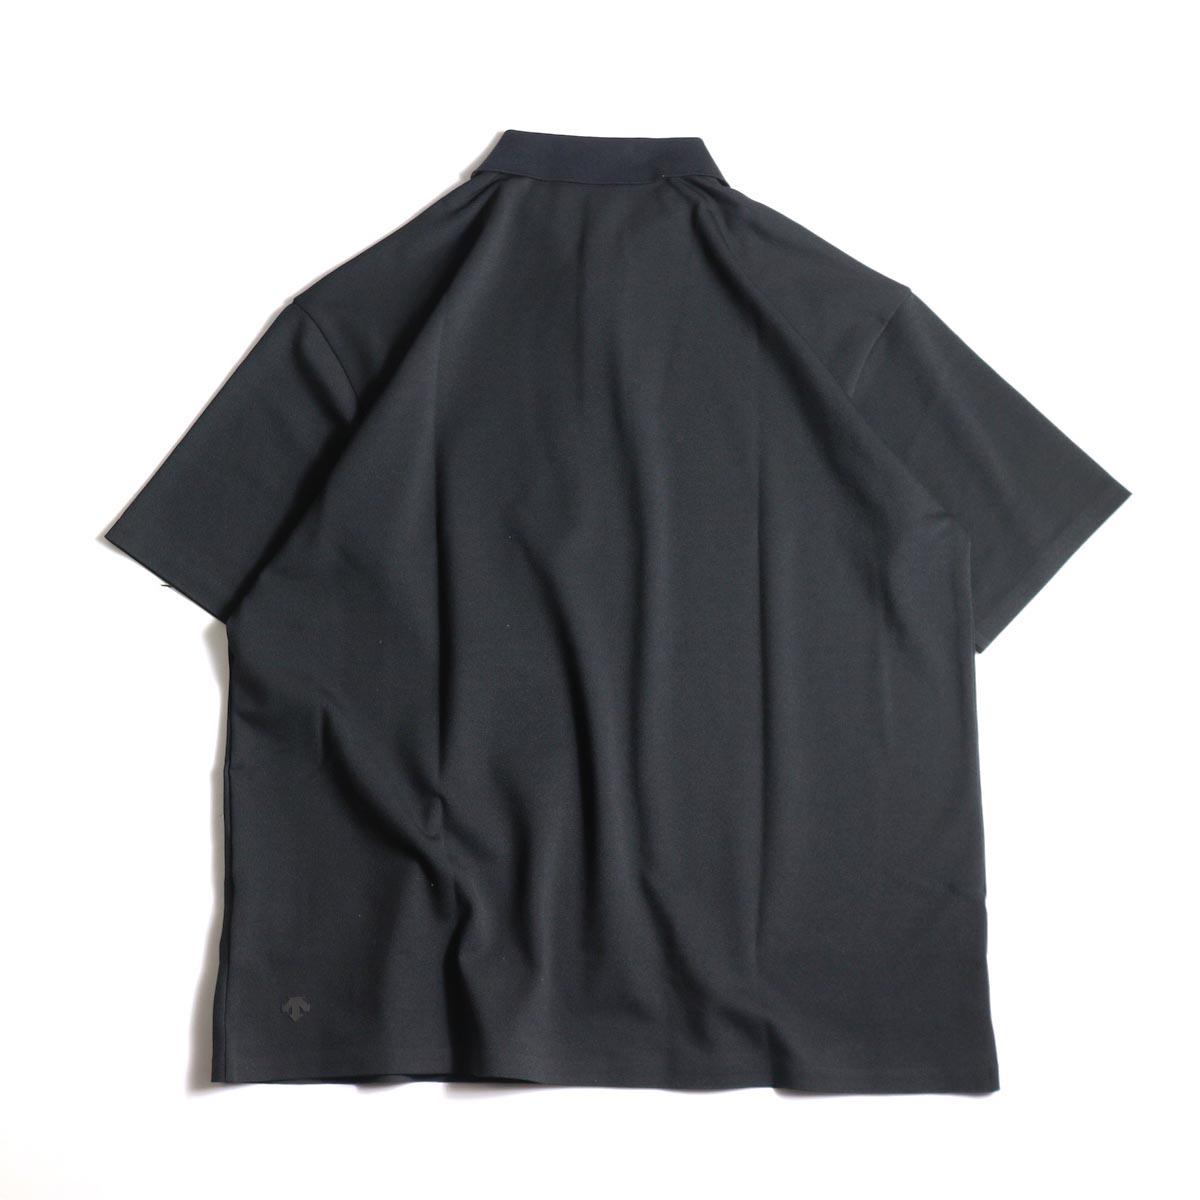 DESCENTE PAUSE / POLO SHIRT (Black)背面